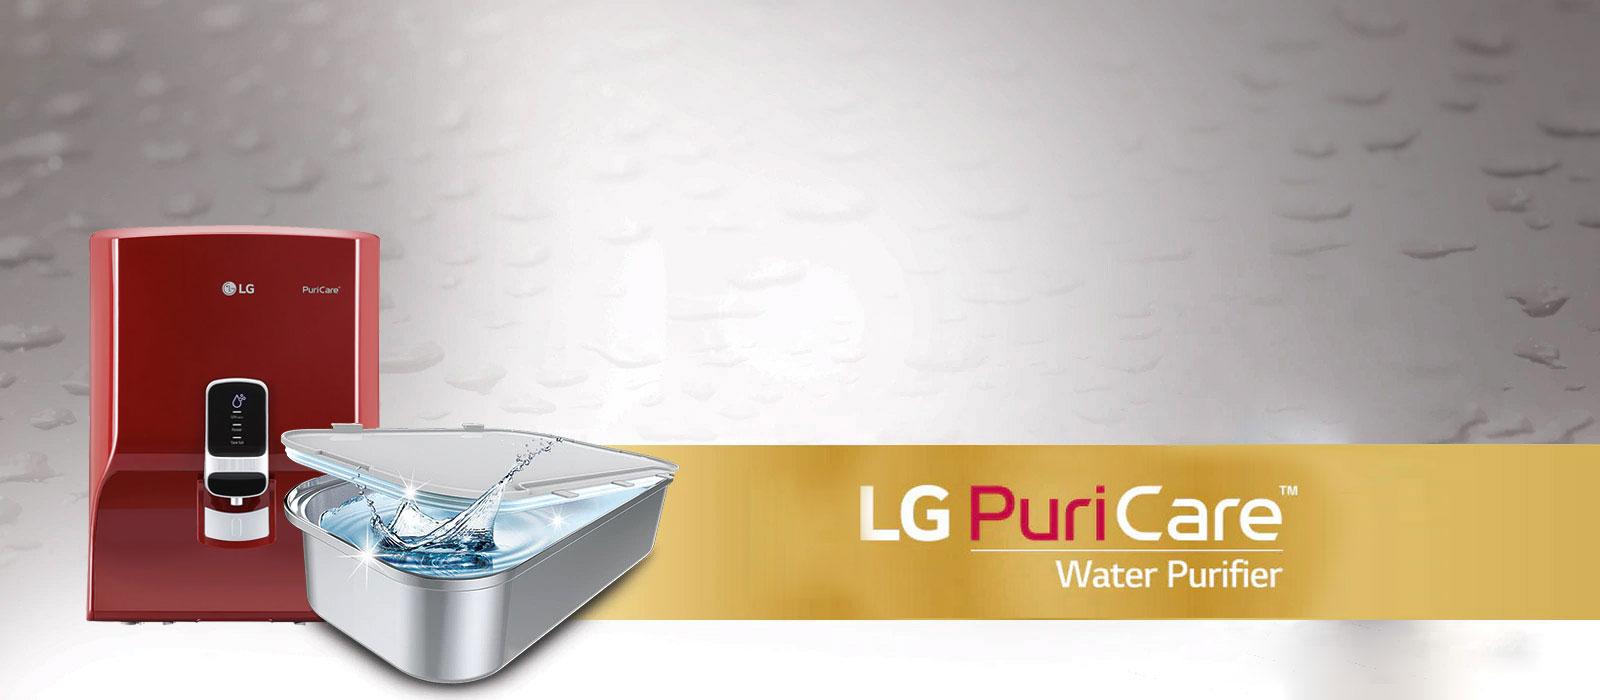 LG PuriCare Water Purifier